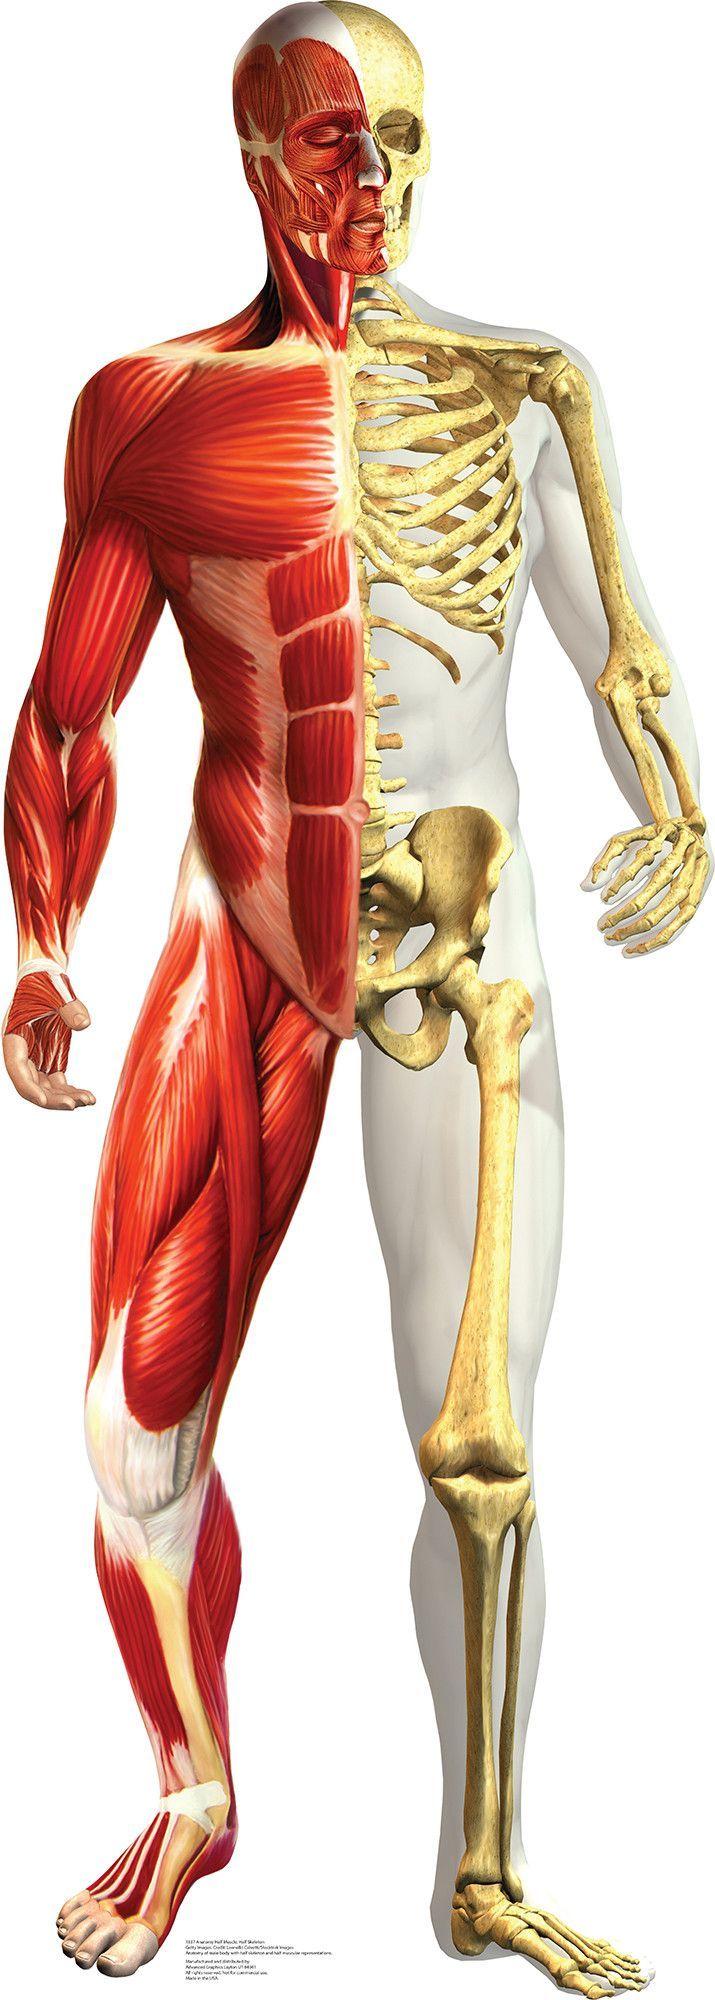 Anatomy Half Muscle Half Skeleton Cardboard Standup | Anatomía ...